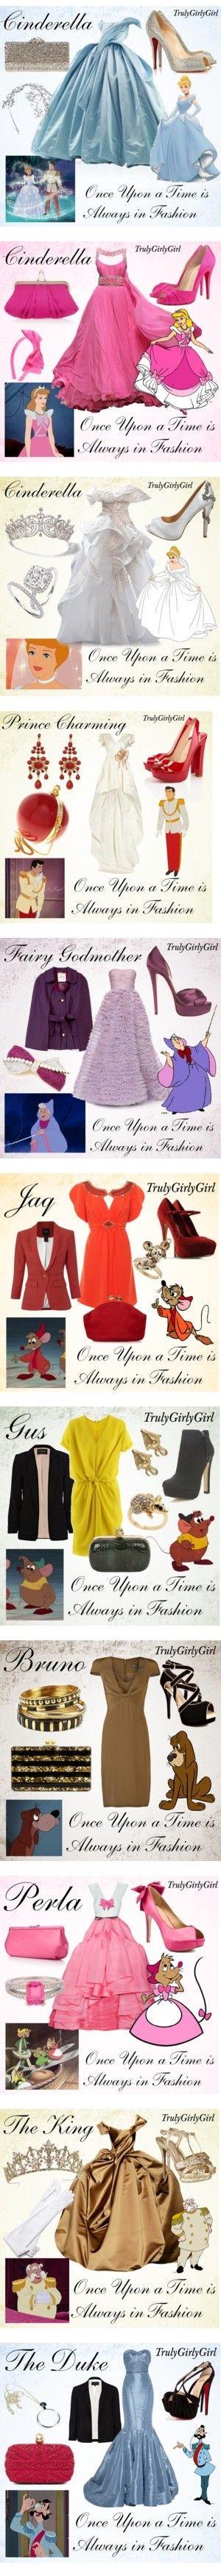 """Cinderella"" in girls dresses"